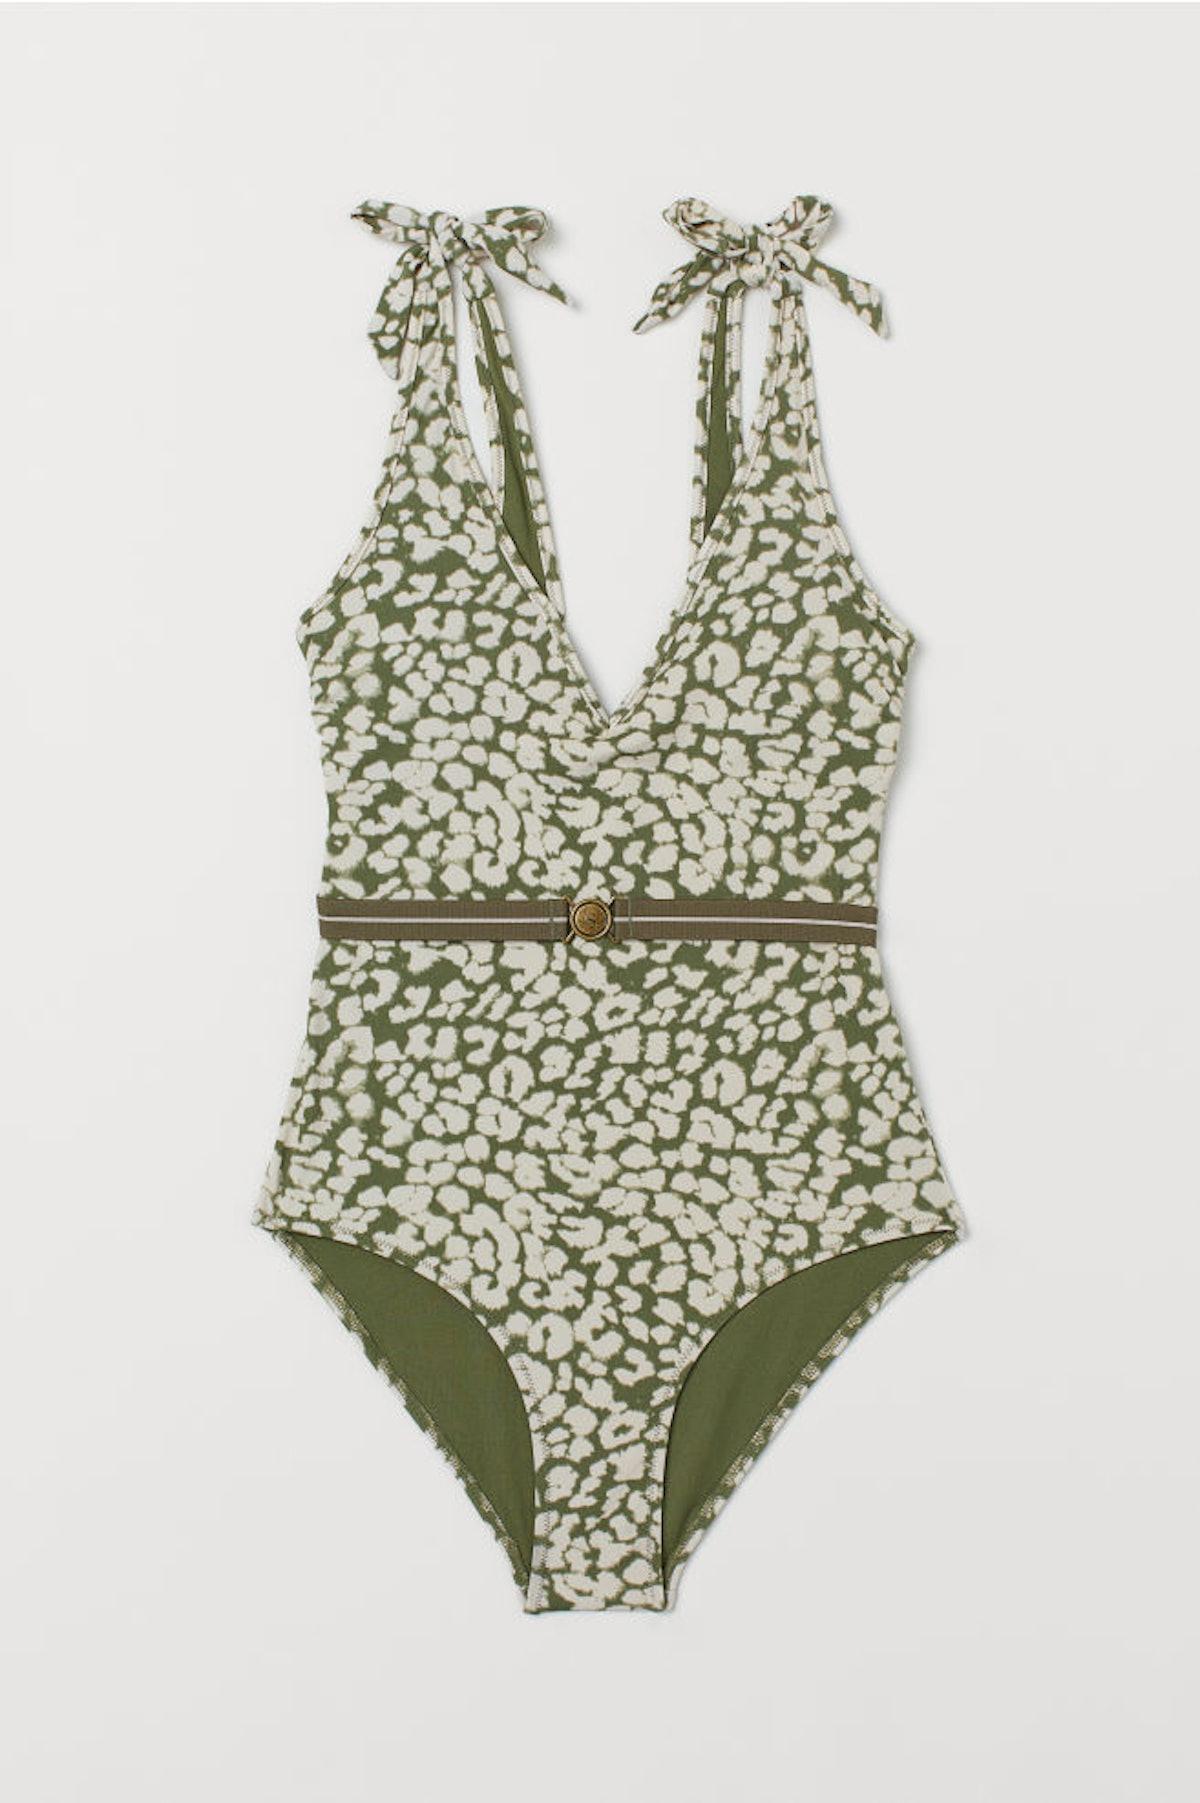 V-neck Swimsuit with Belt